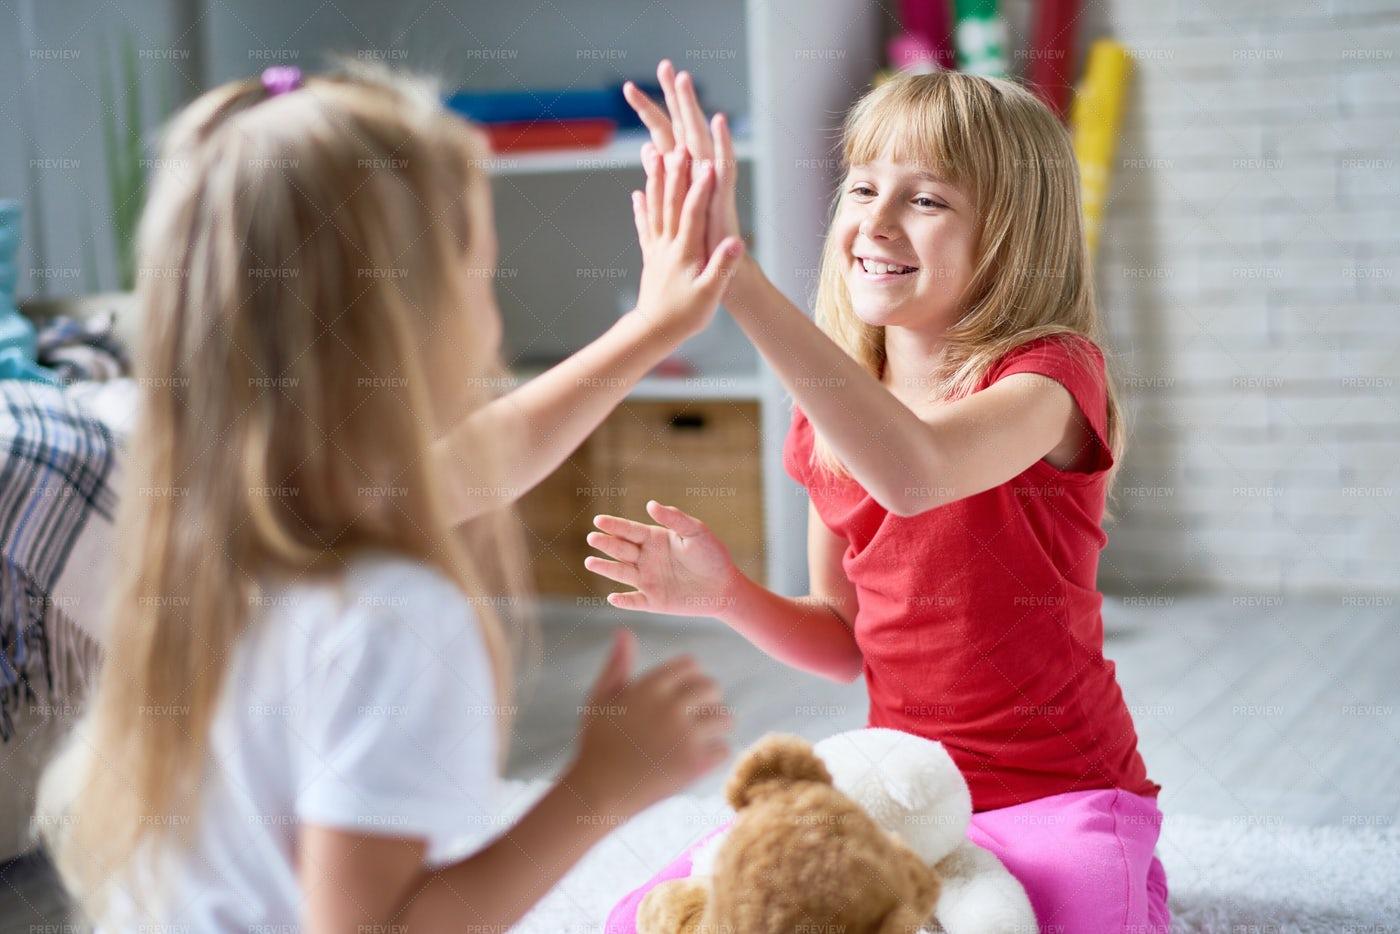 Joyful Little Girls Playing...: Stock Photos